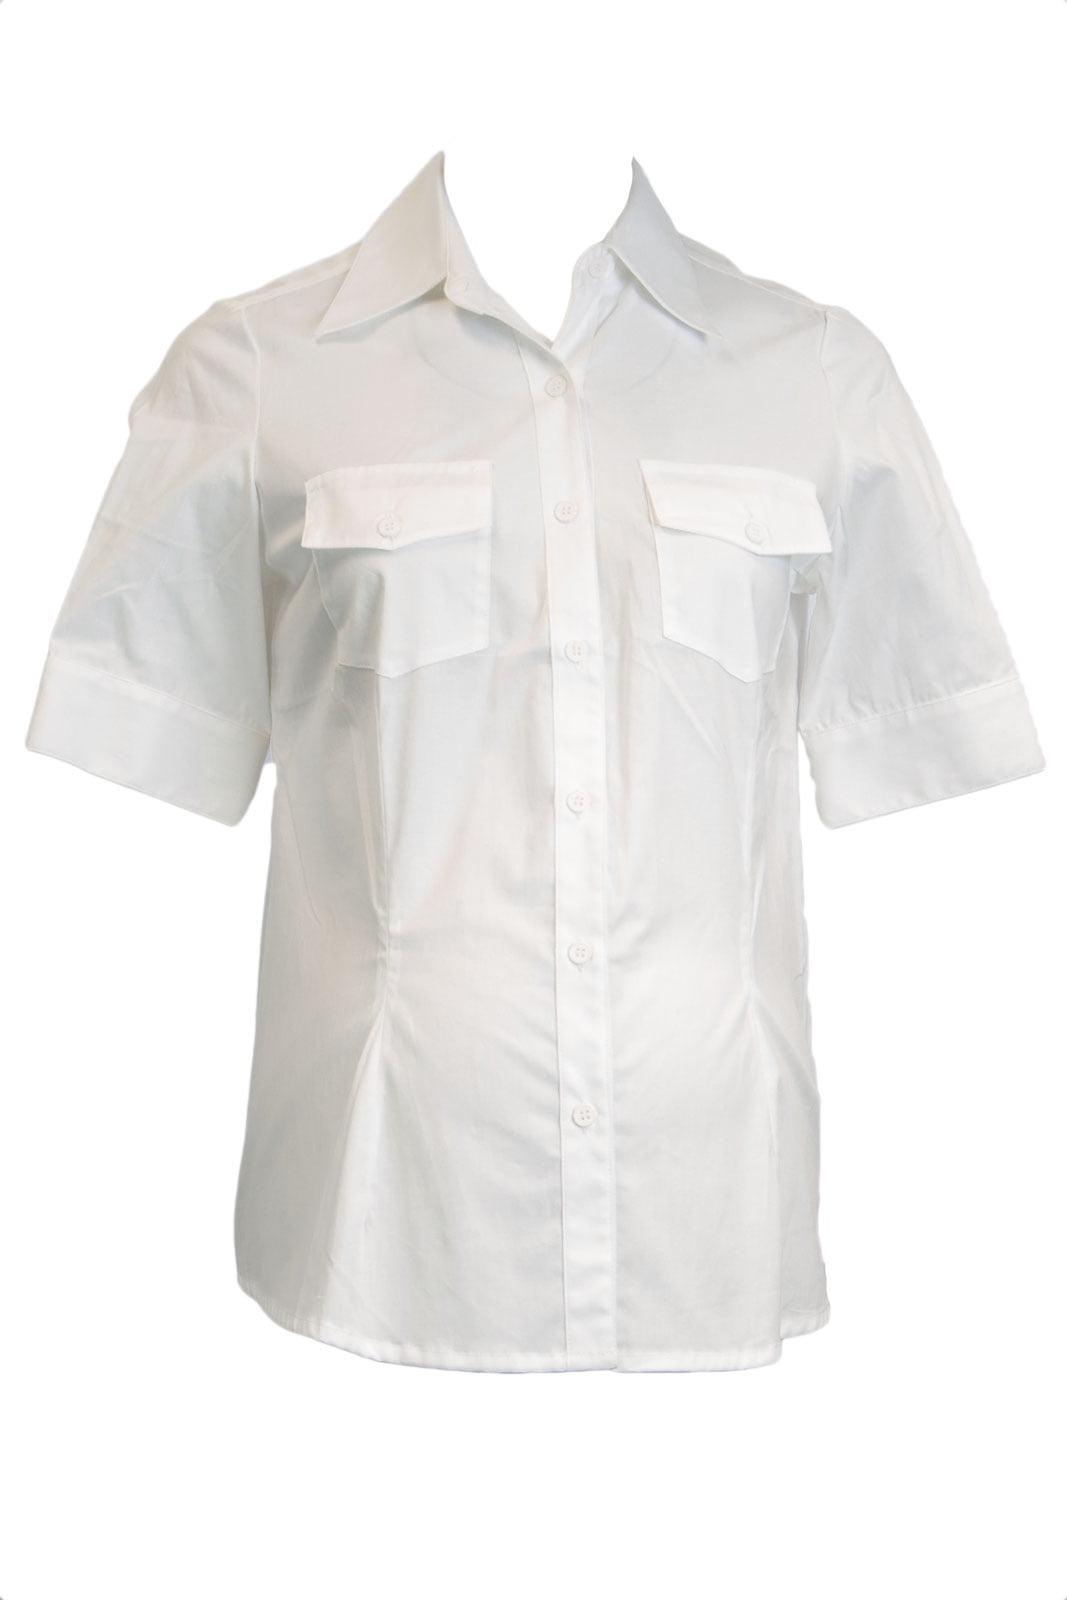 OLIAN Maternity Women's Button Down Short Sleeve Blouse X-Small White